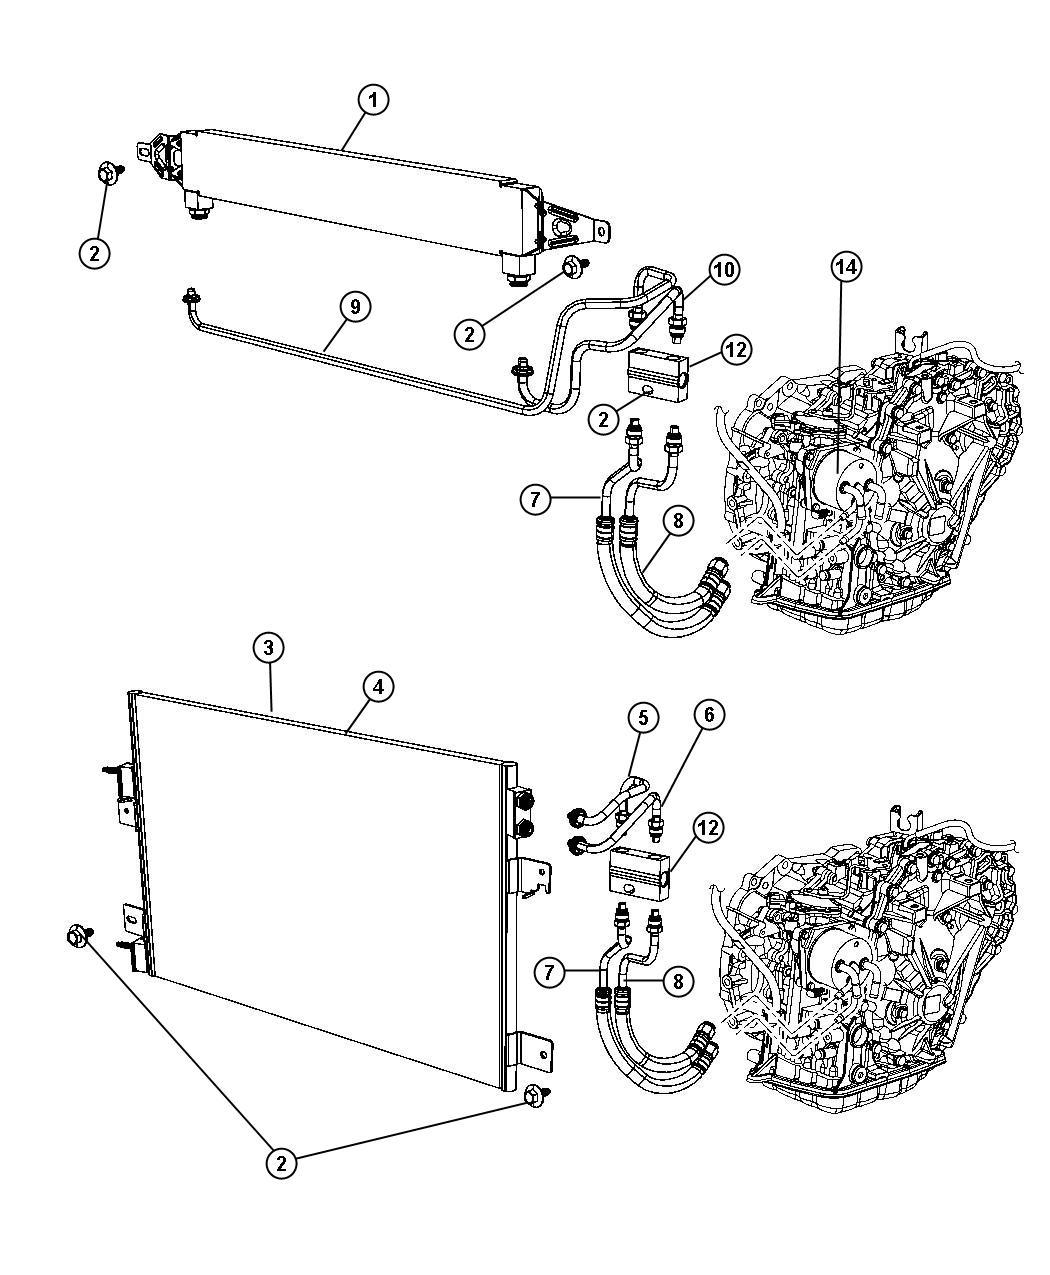 oem jeep parts online factory chrysler parts auto parts. Cars Review. Best American Auto & Cars Review